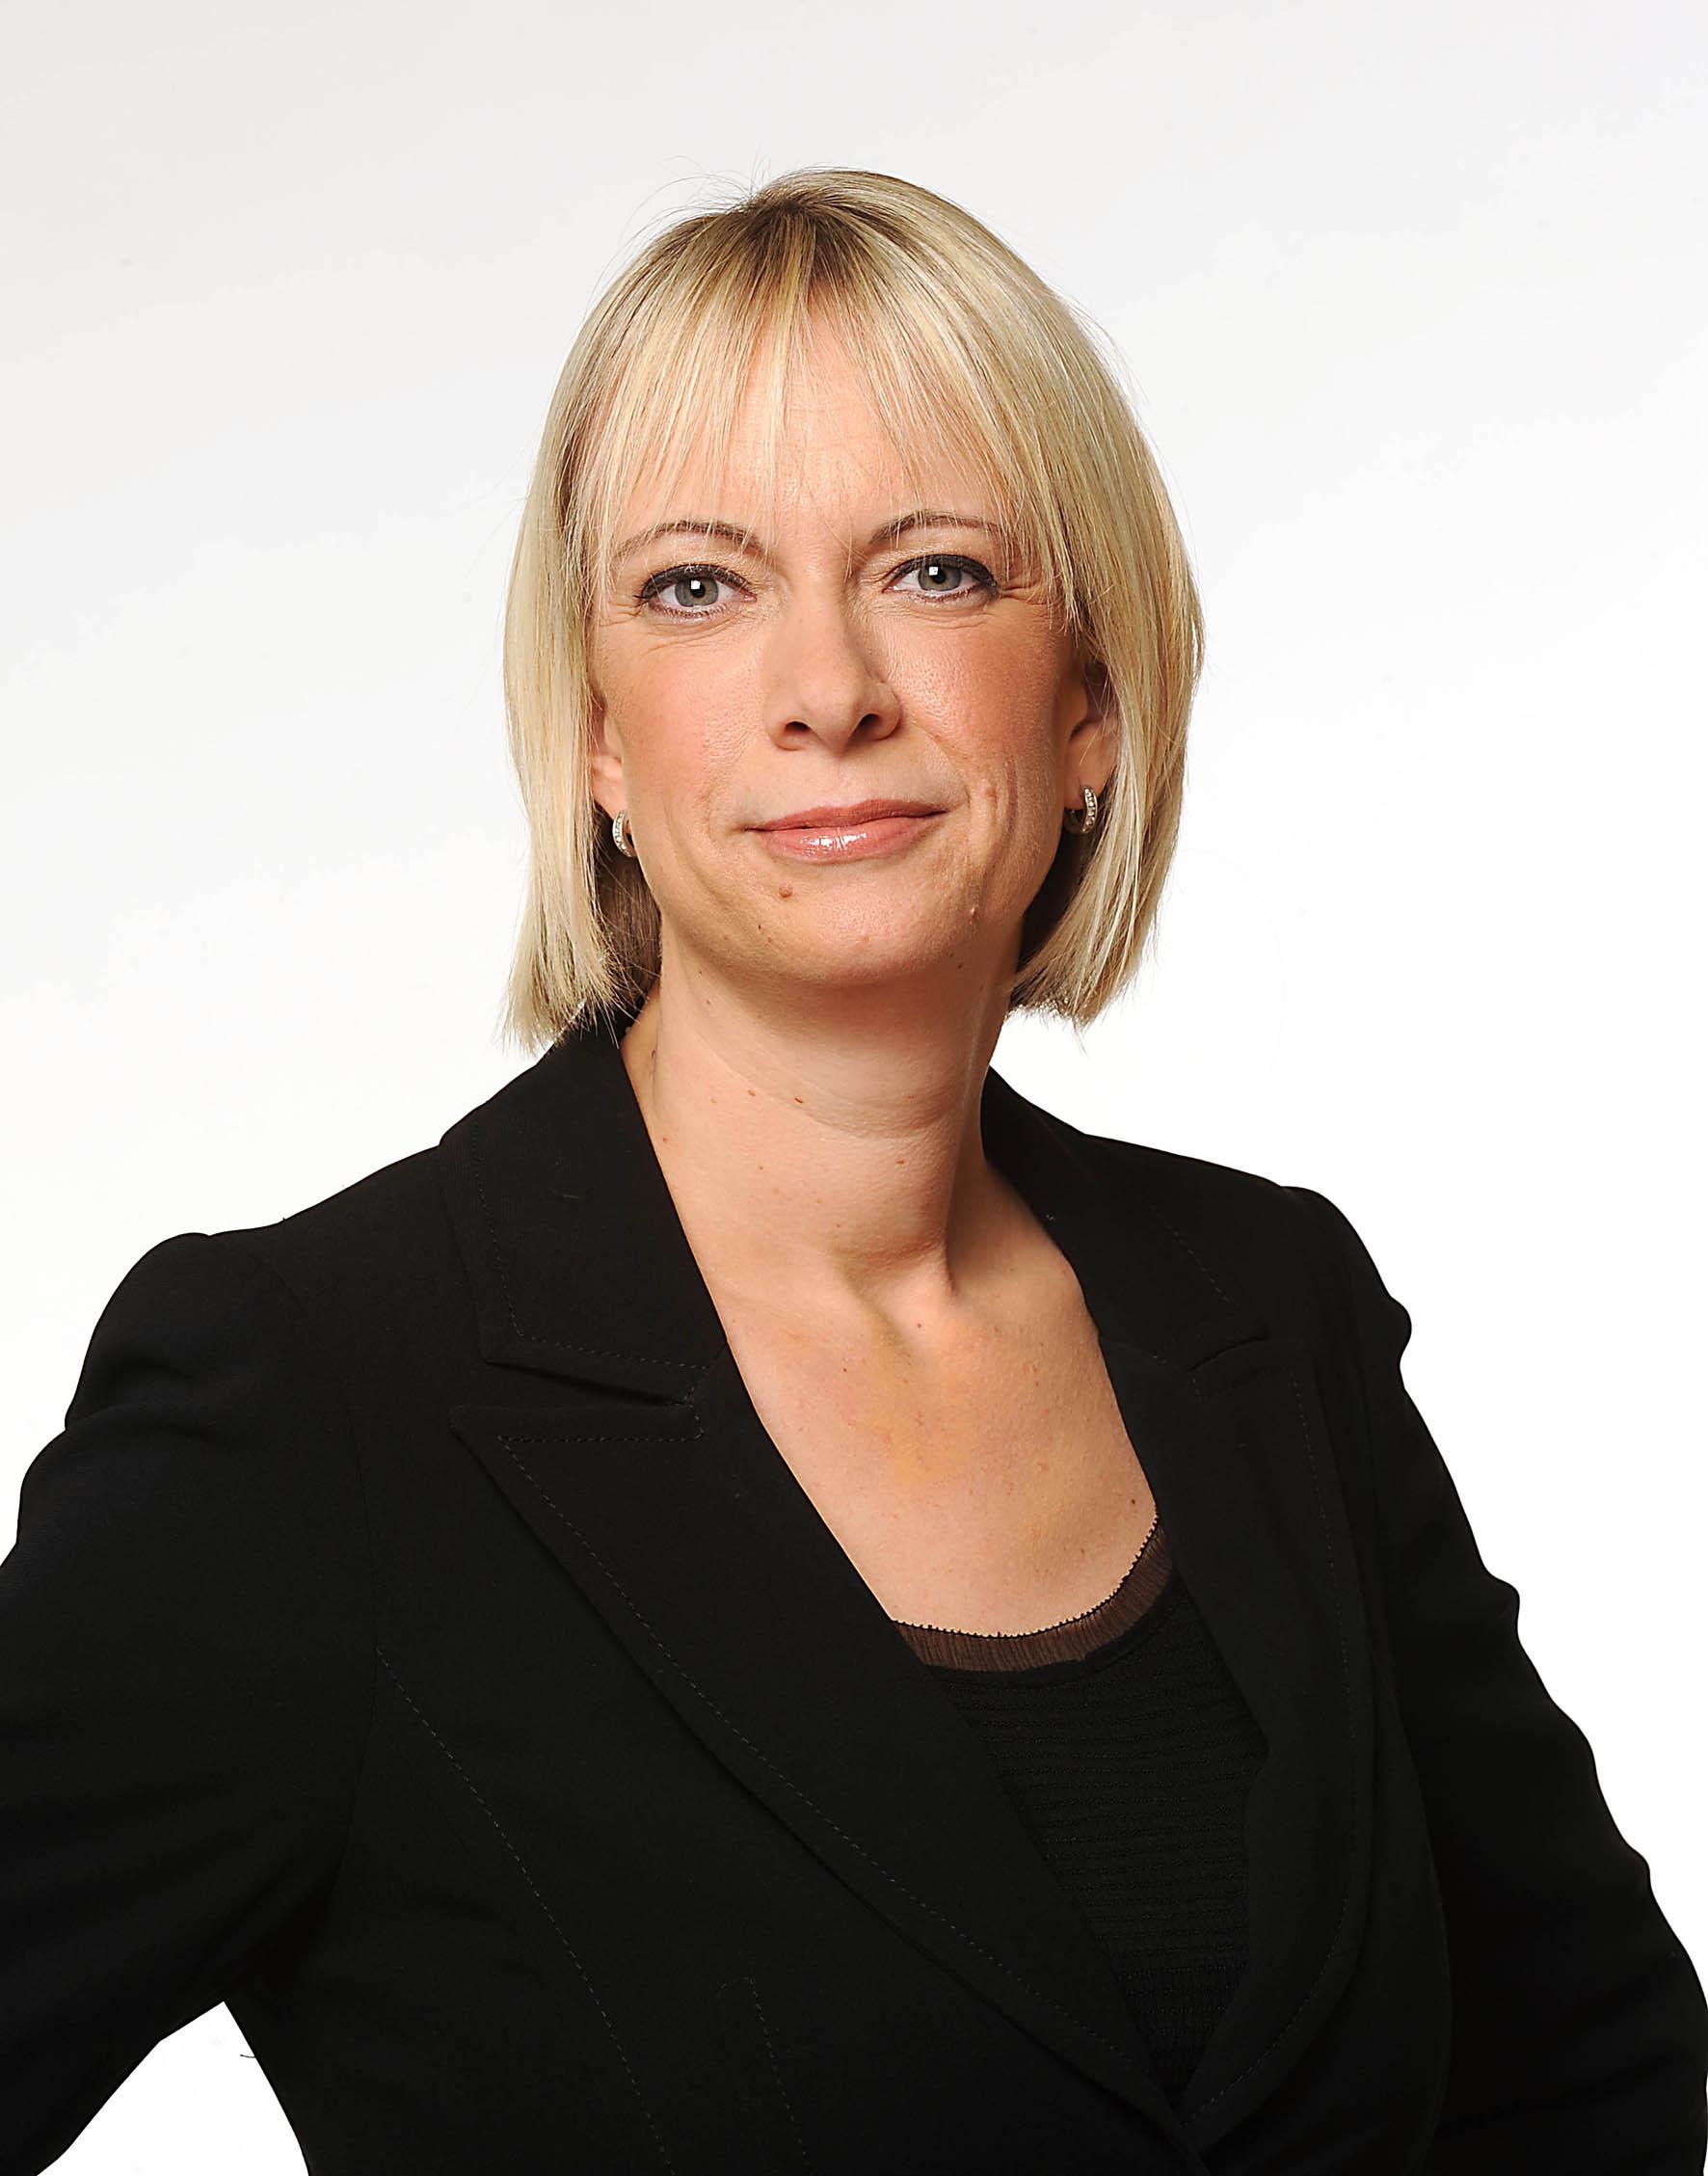 Fiona Ball